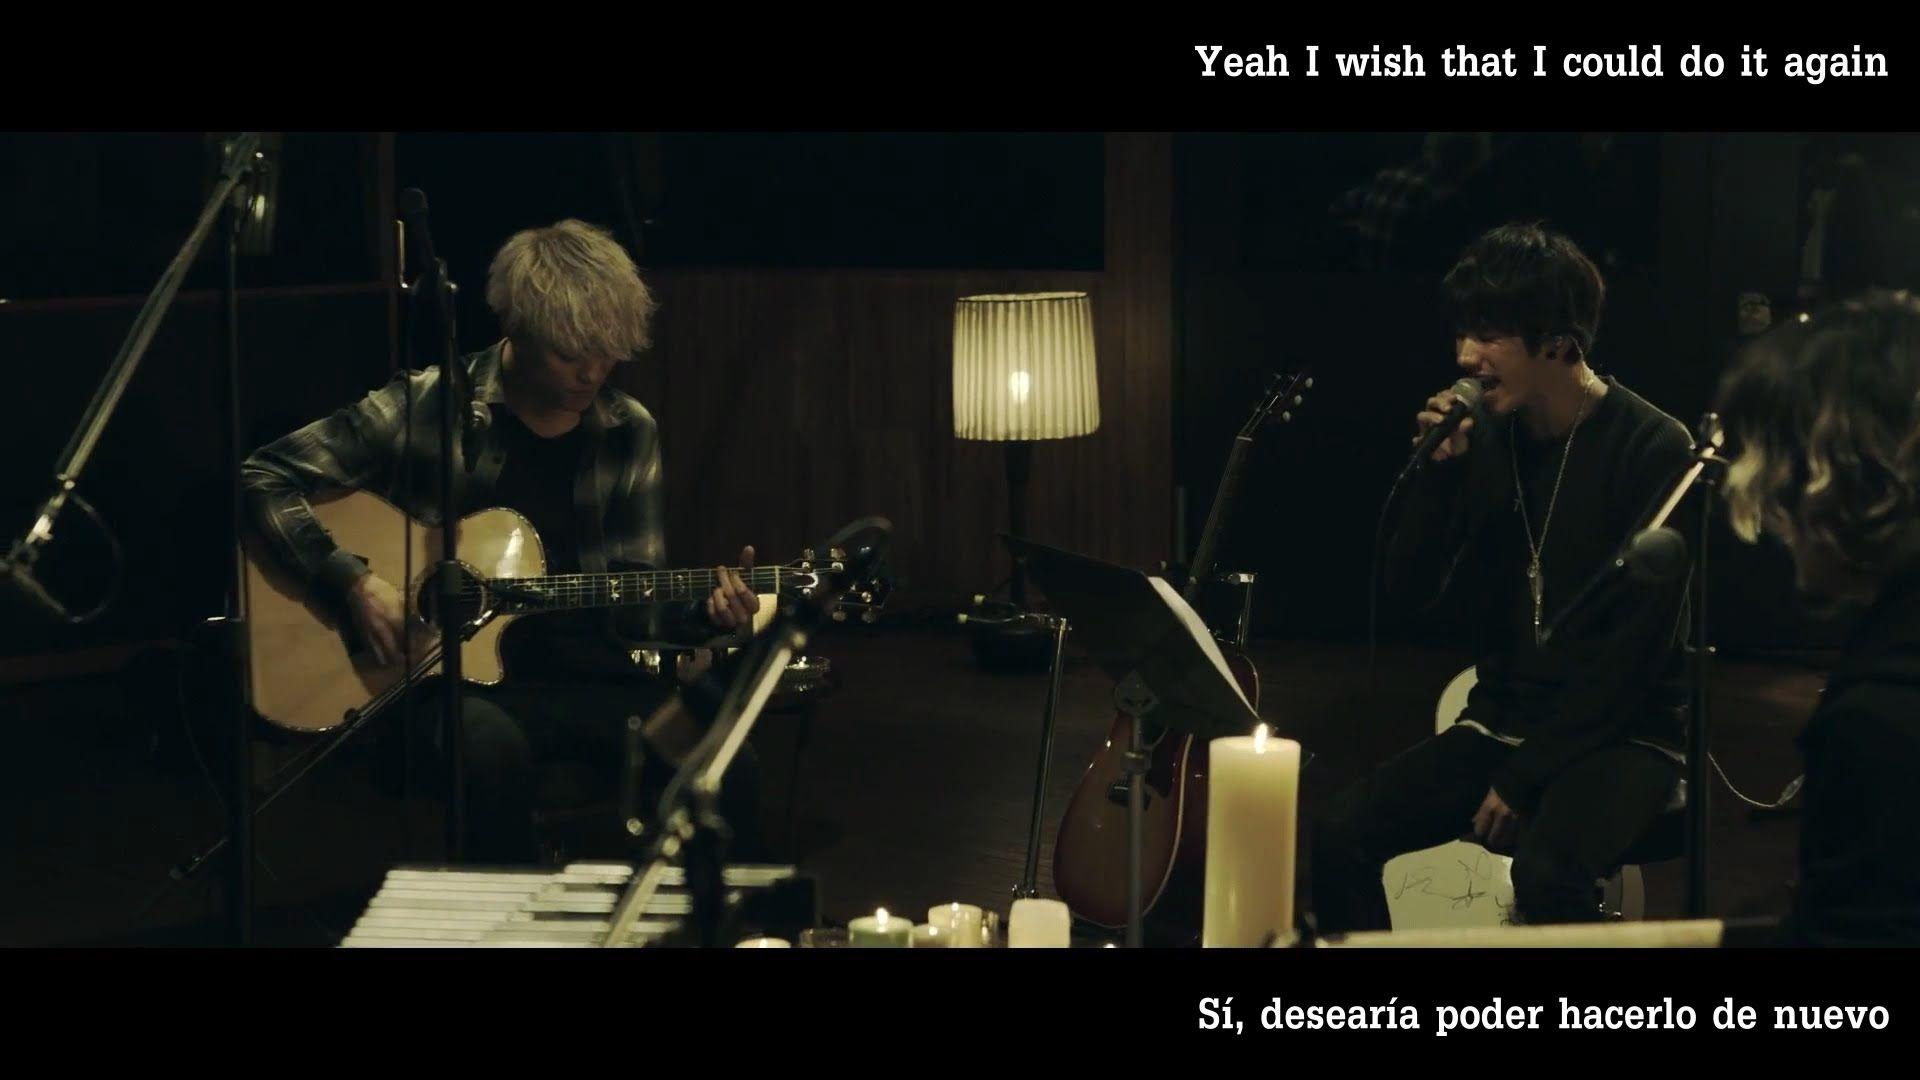 ONE OK ROCK - Heartache [Studio Jam Session] (Sub Español) // Letras: http://mellnoct.blogspot.com/2015/02/one-ok-rock-heartache.html